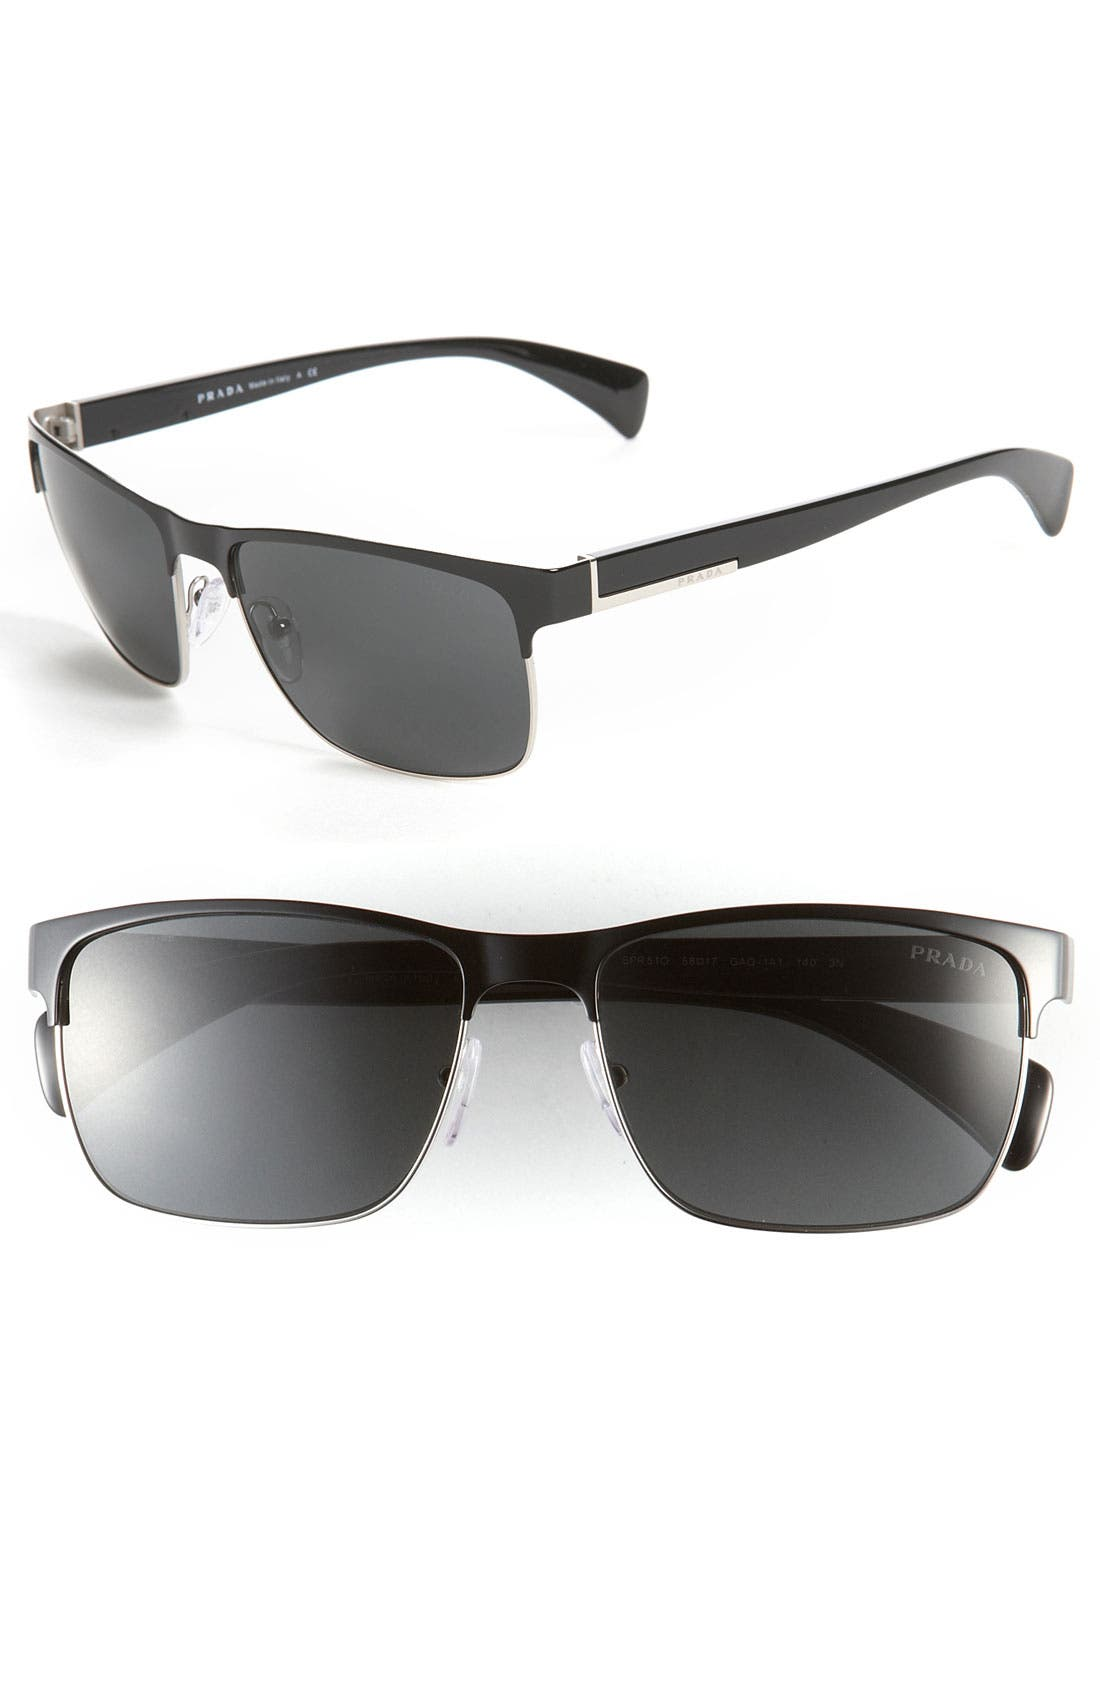 Main Image - Prada 58mm Sunglasses